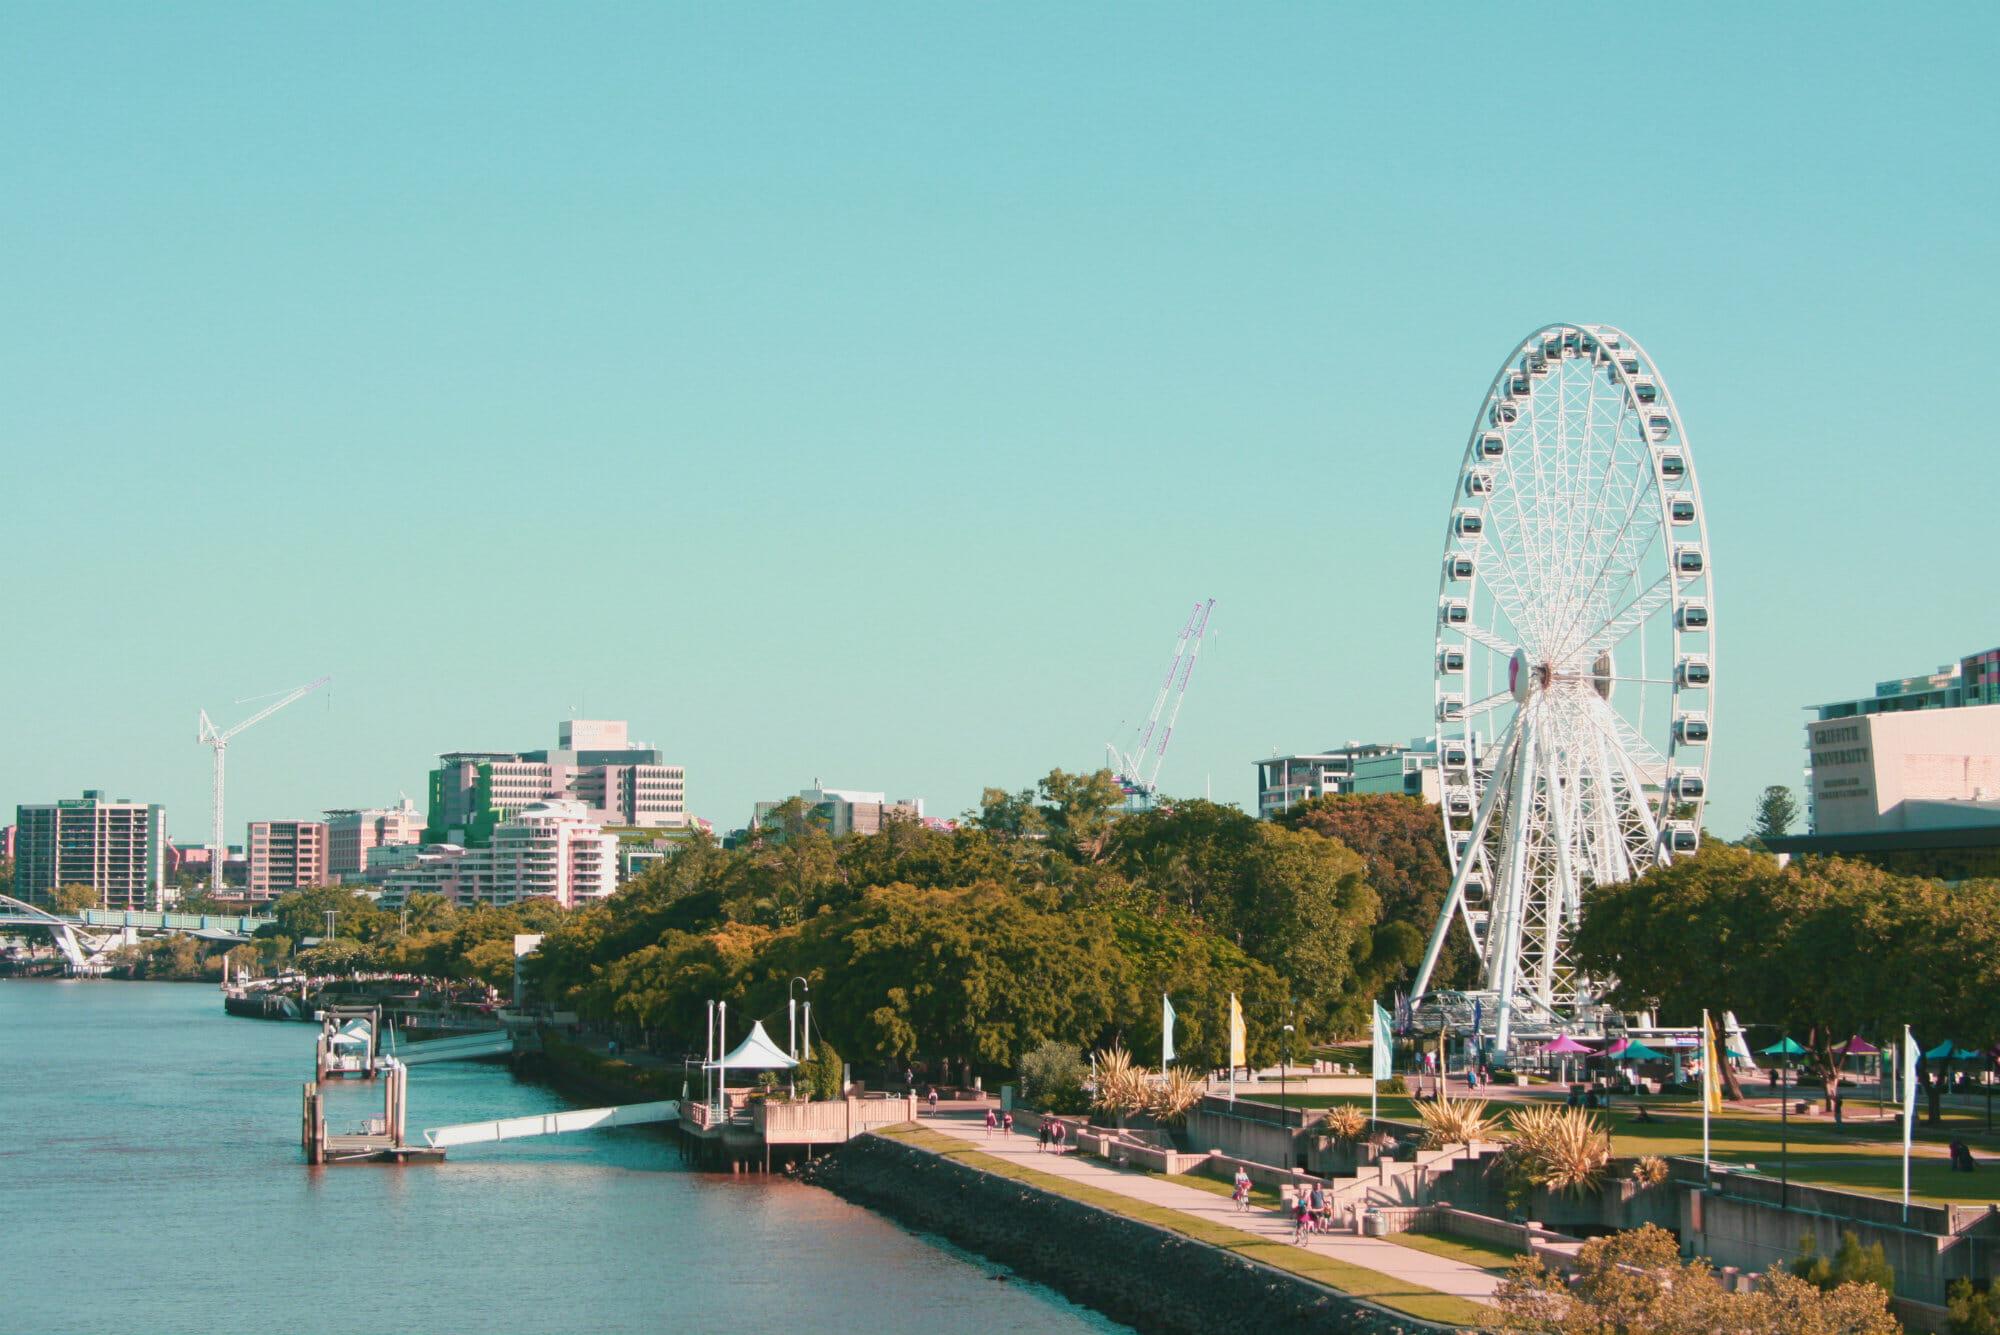 The Brisbane wheel at South Bank, Brisbane, QLD